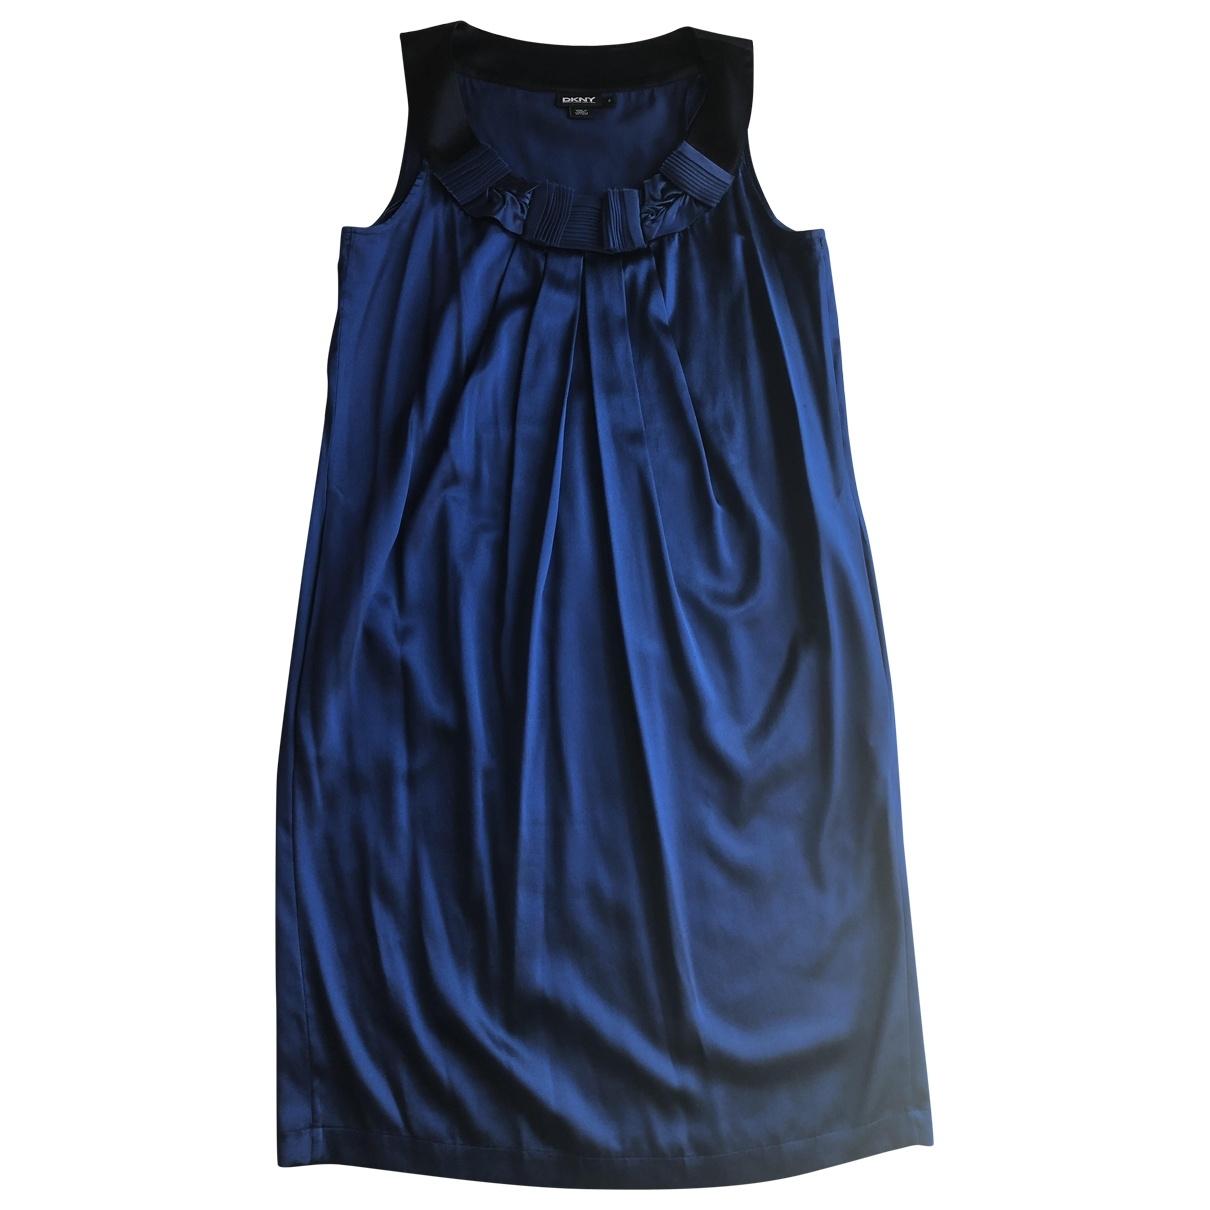 Dkny \N Blue Silk dress for Women XS International